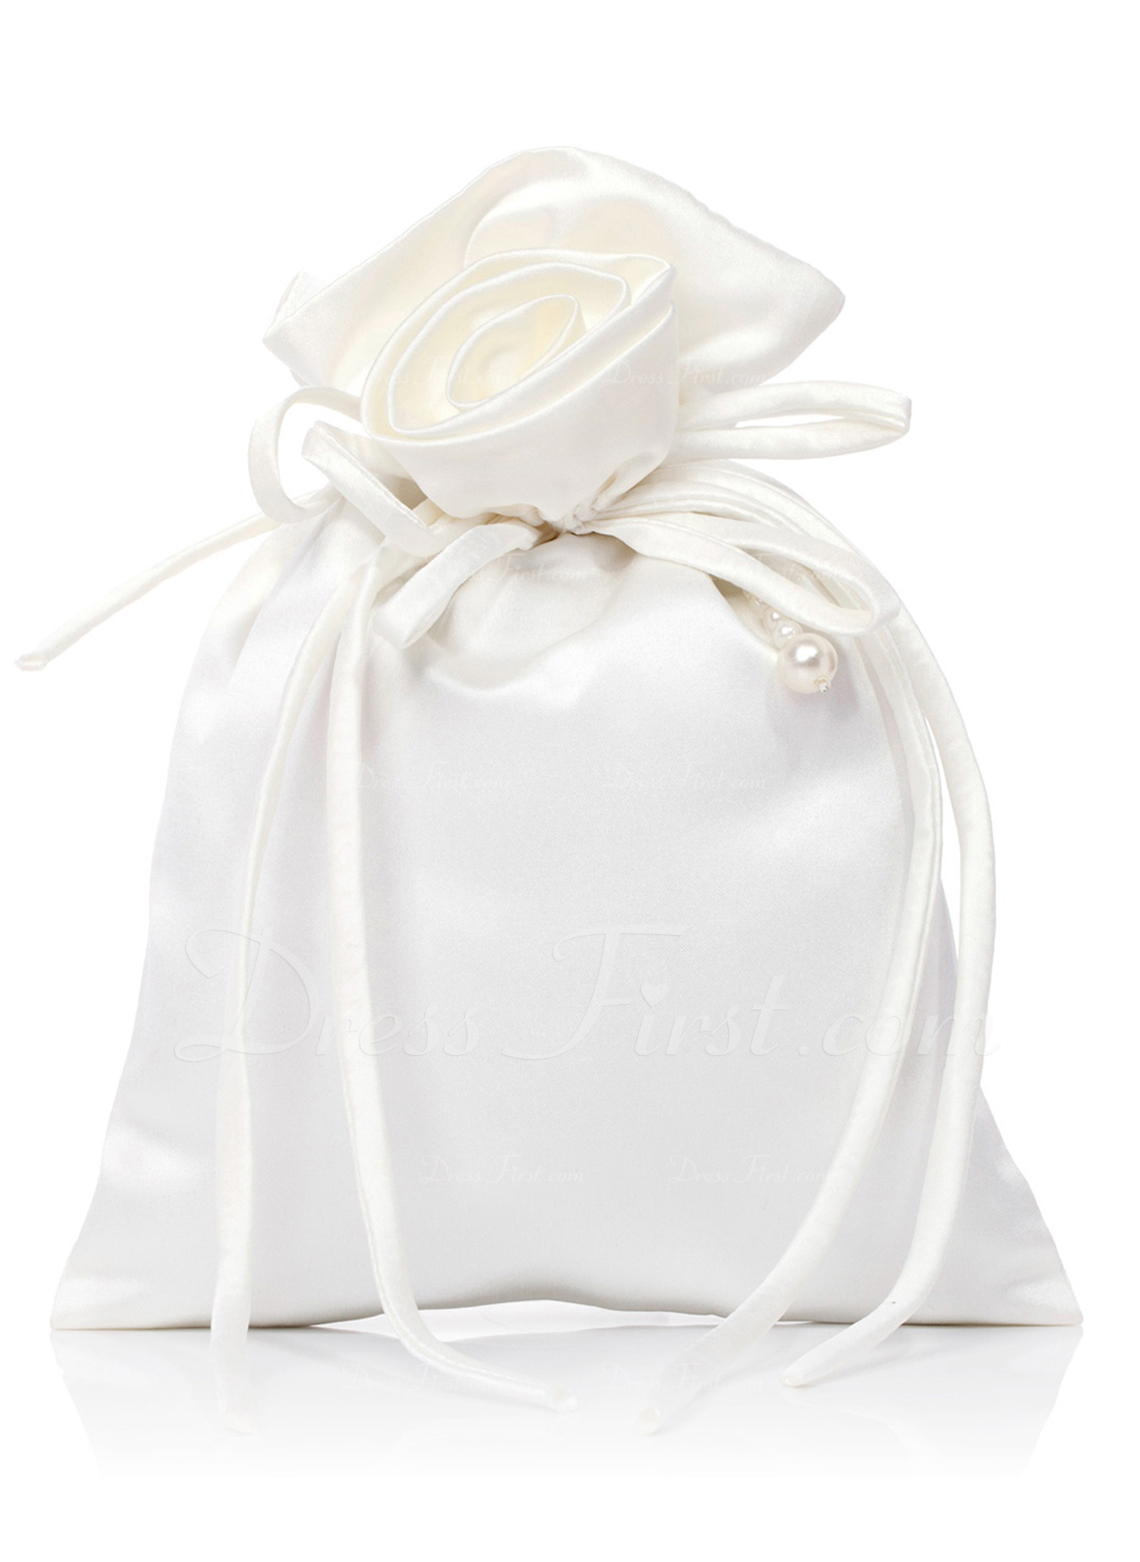 Satin With Lace/Imitation Pearls Handbag (198076184) - Flower Girl ...